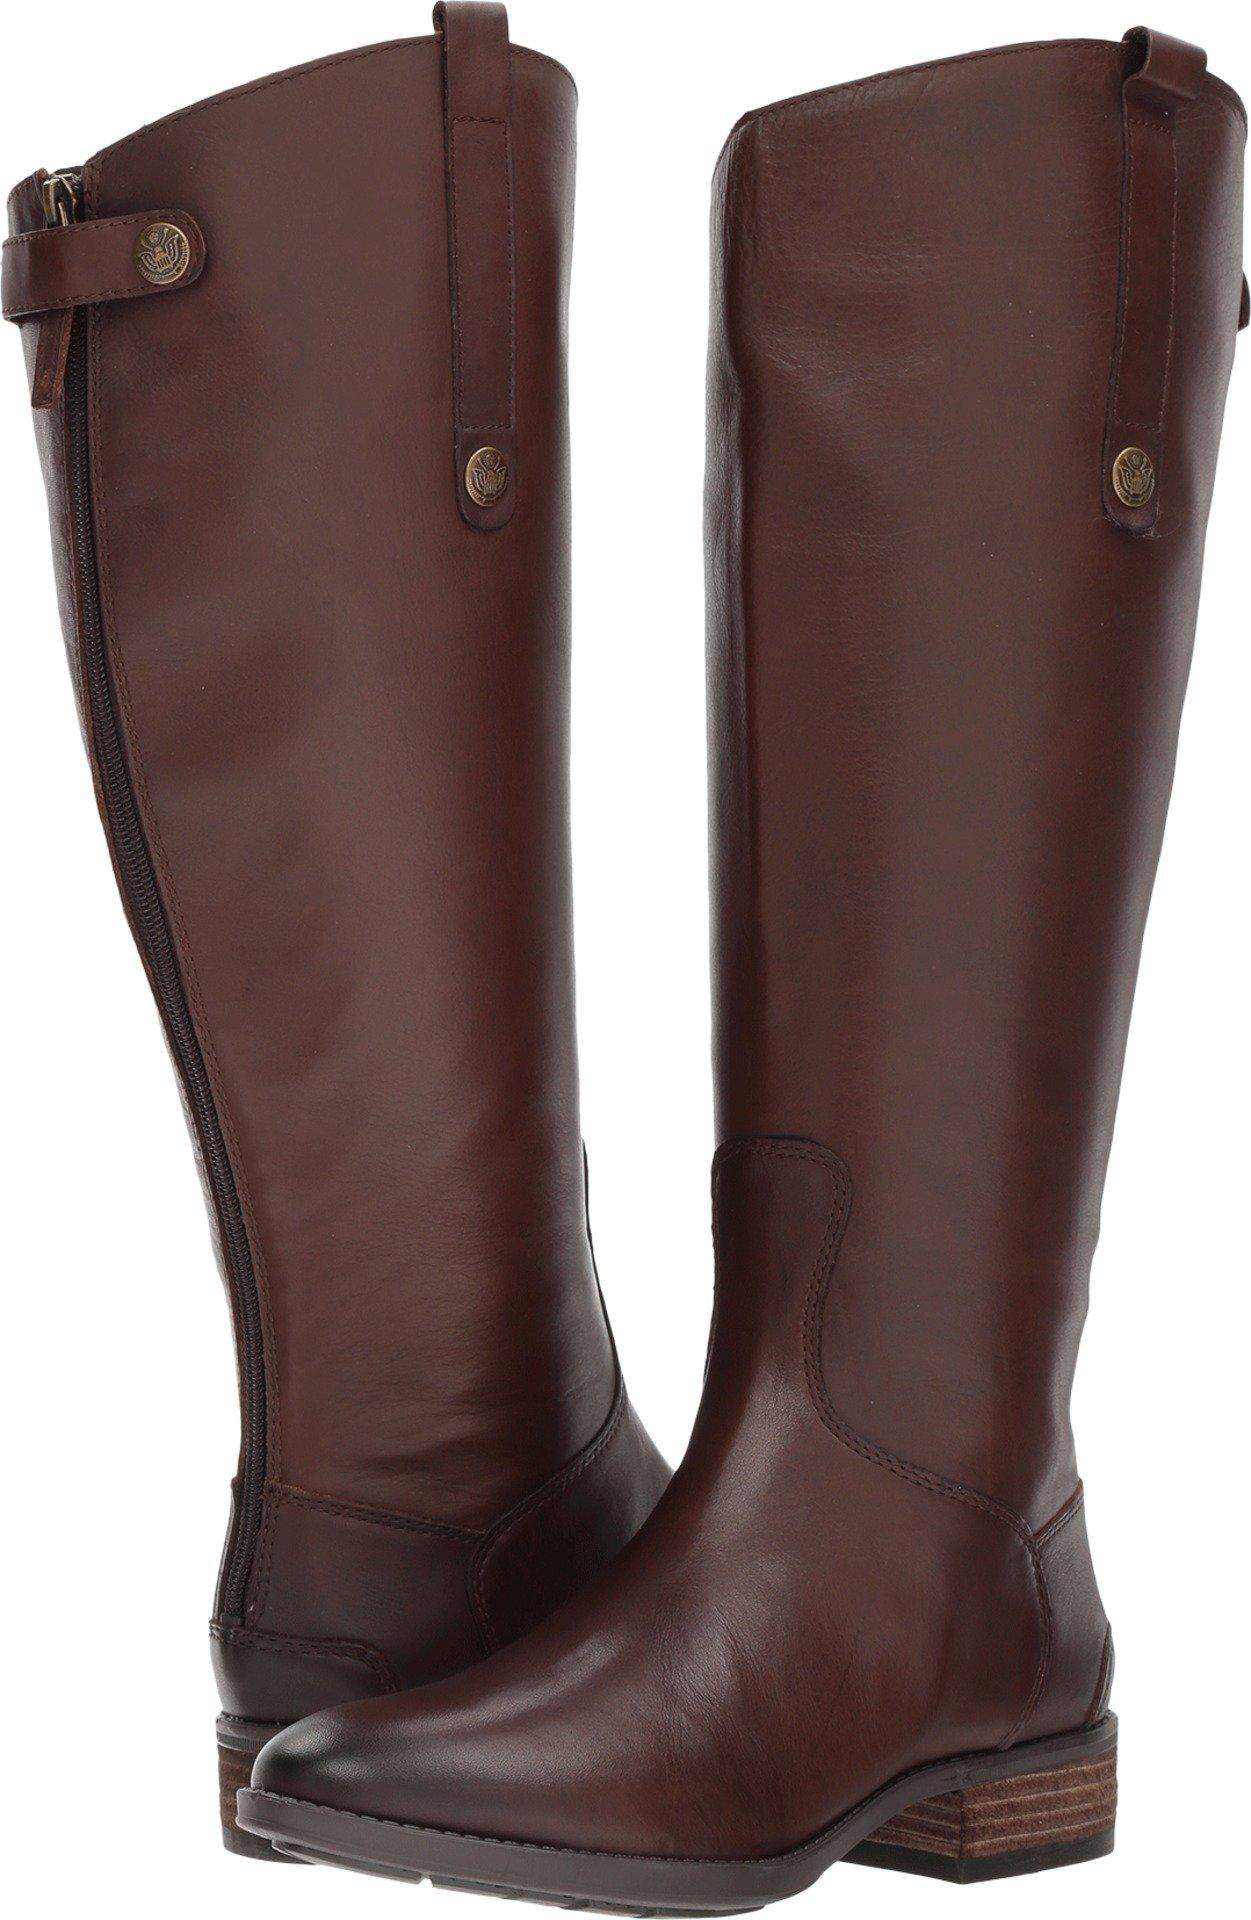 Sam Edelman Women's Penny 2 Dark Brown Basto Crust Leather 7 W US